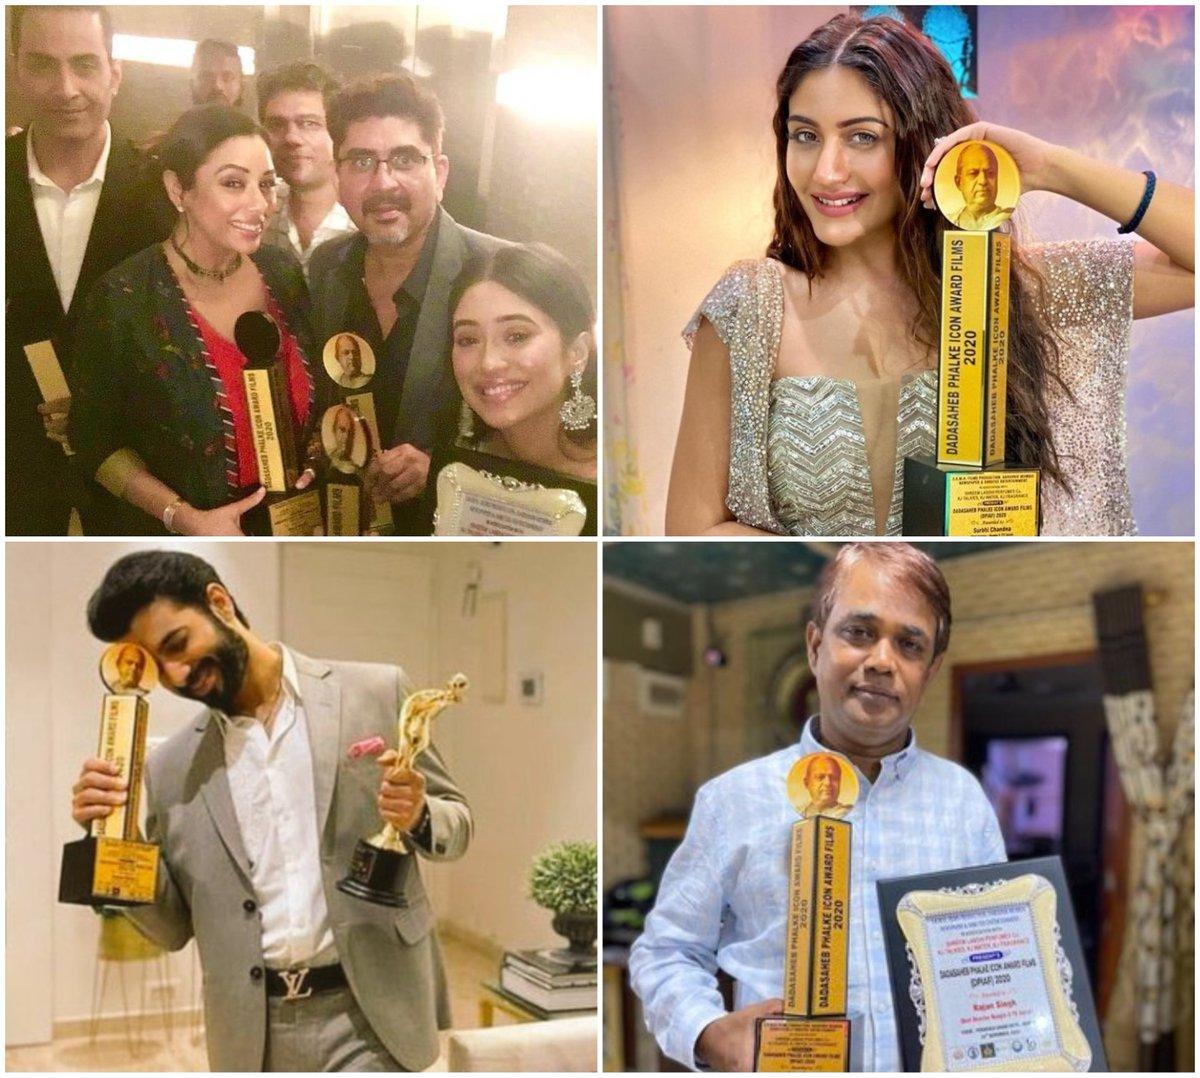 Best Actress - #SurbhiChandna Best Actor - Sharad Malhotra Best Director - #Naagin5 Best Jodi - #Kaira (#ShivangiJoshi - #MohsinKhan) Adaa Khan, Arjun Bijlani also won award at #DadaSahebPhalkeAwards 2020  #SharadMalhotra #VAni  #YRKKH #AdaaKhan #ArjunBijlani #anupama https://t.co/SqqI4MYlW2